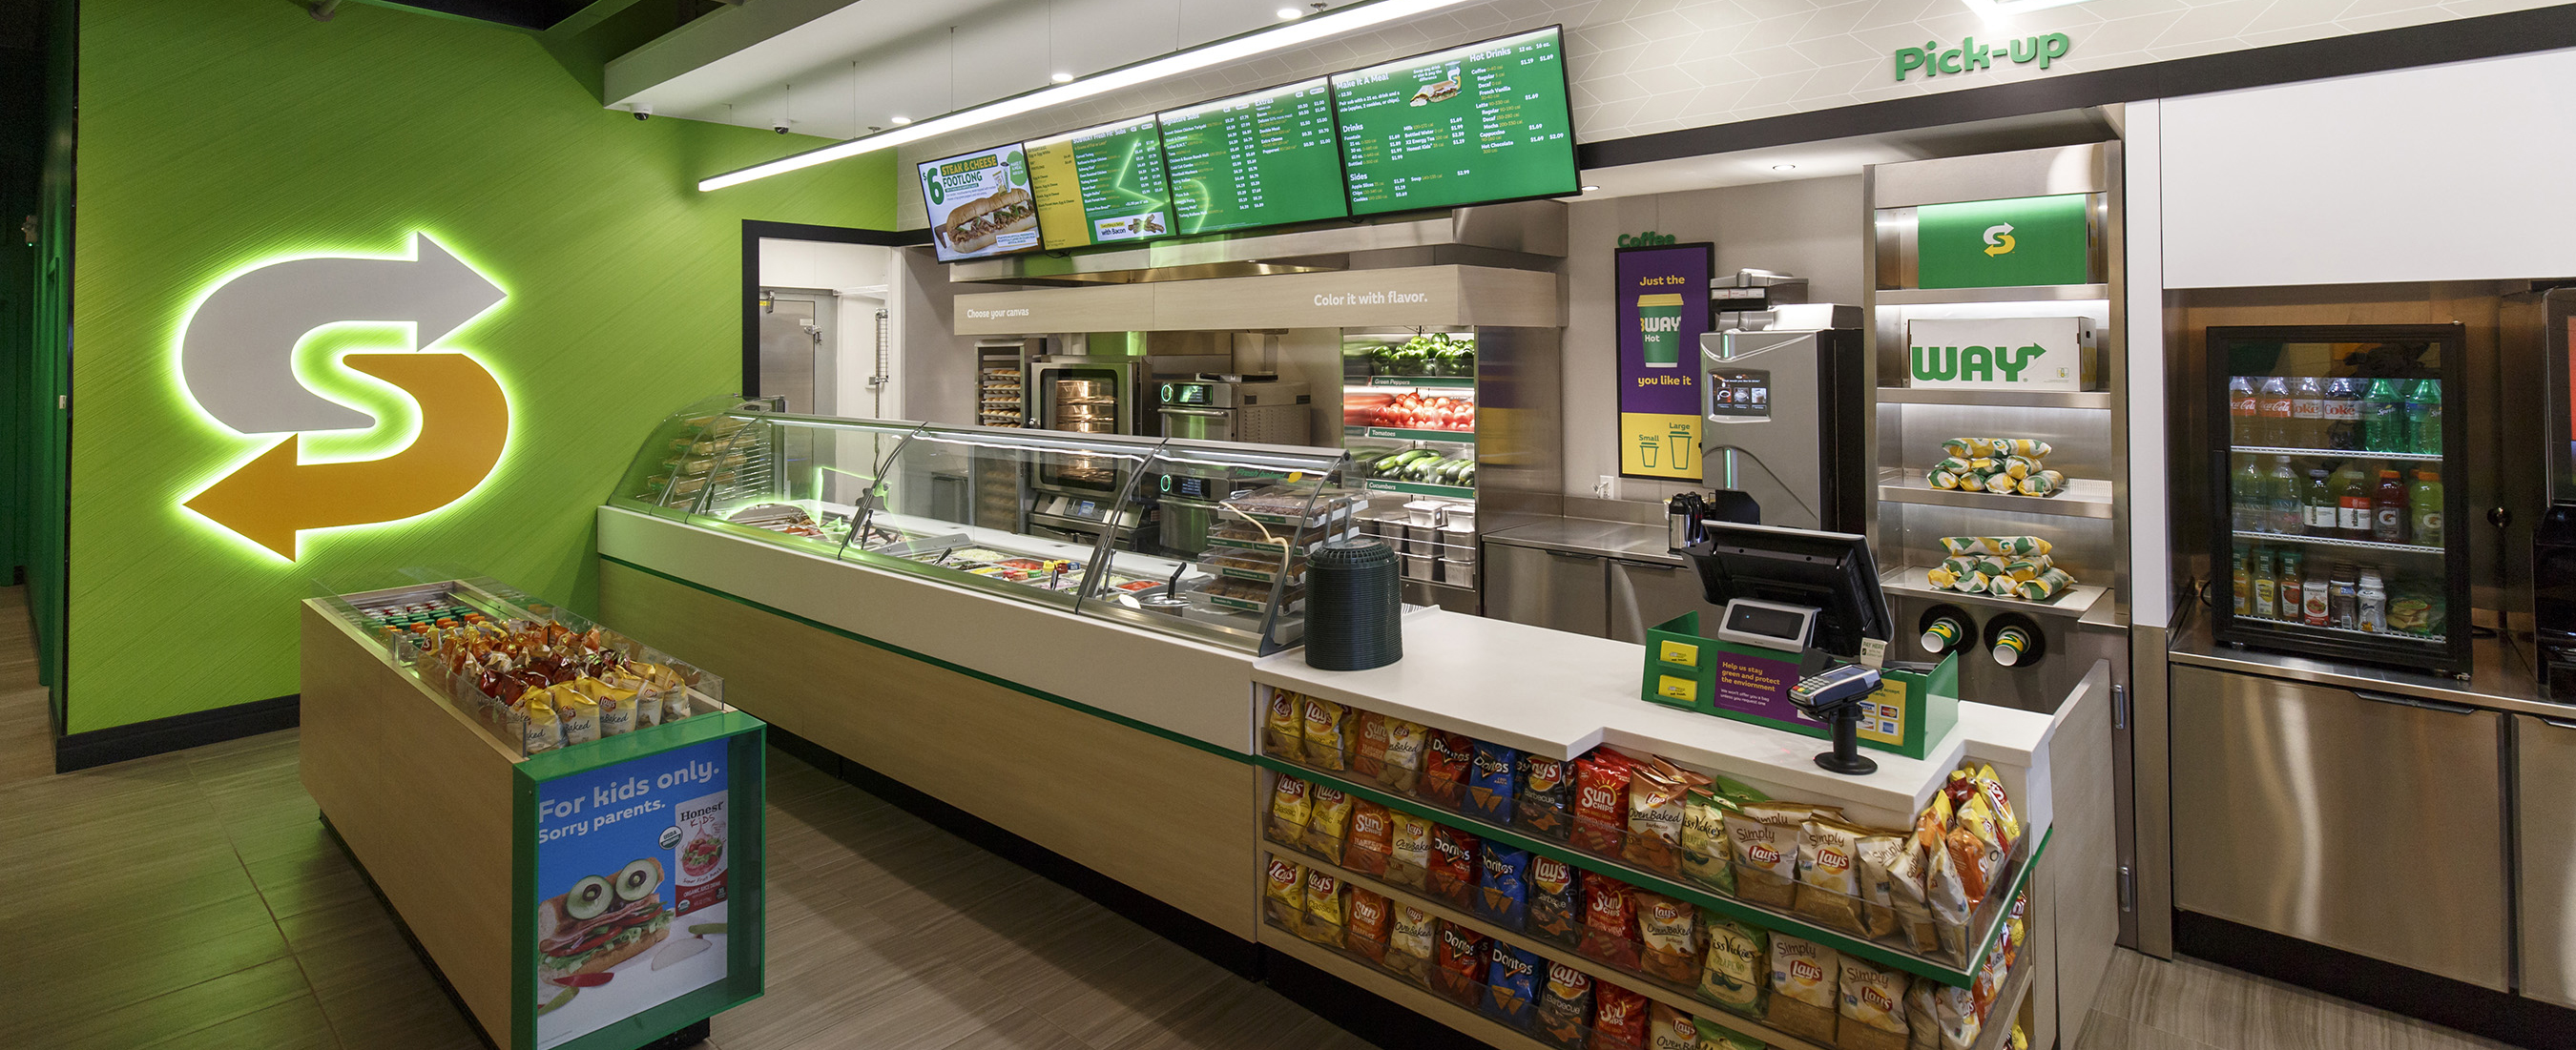 Subway brings 'fresh forward with new restaurant design